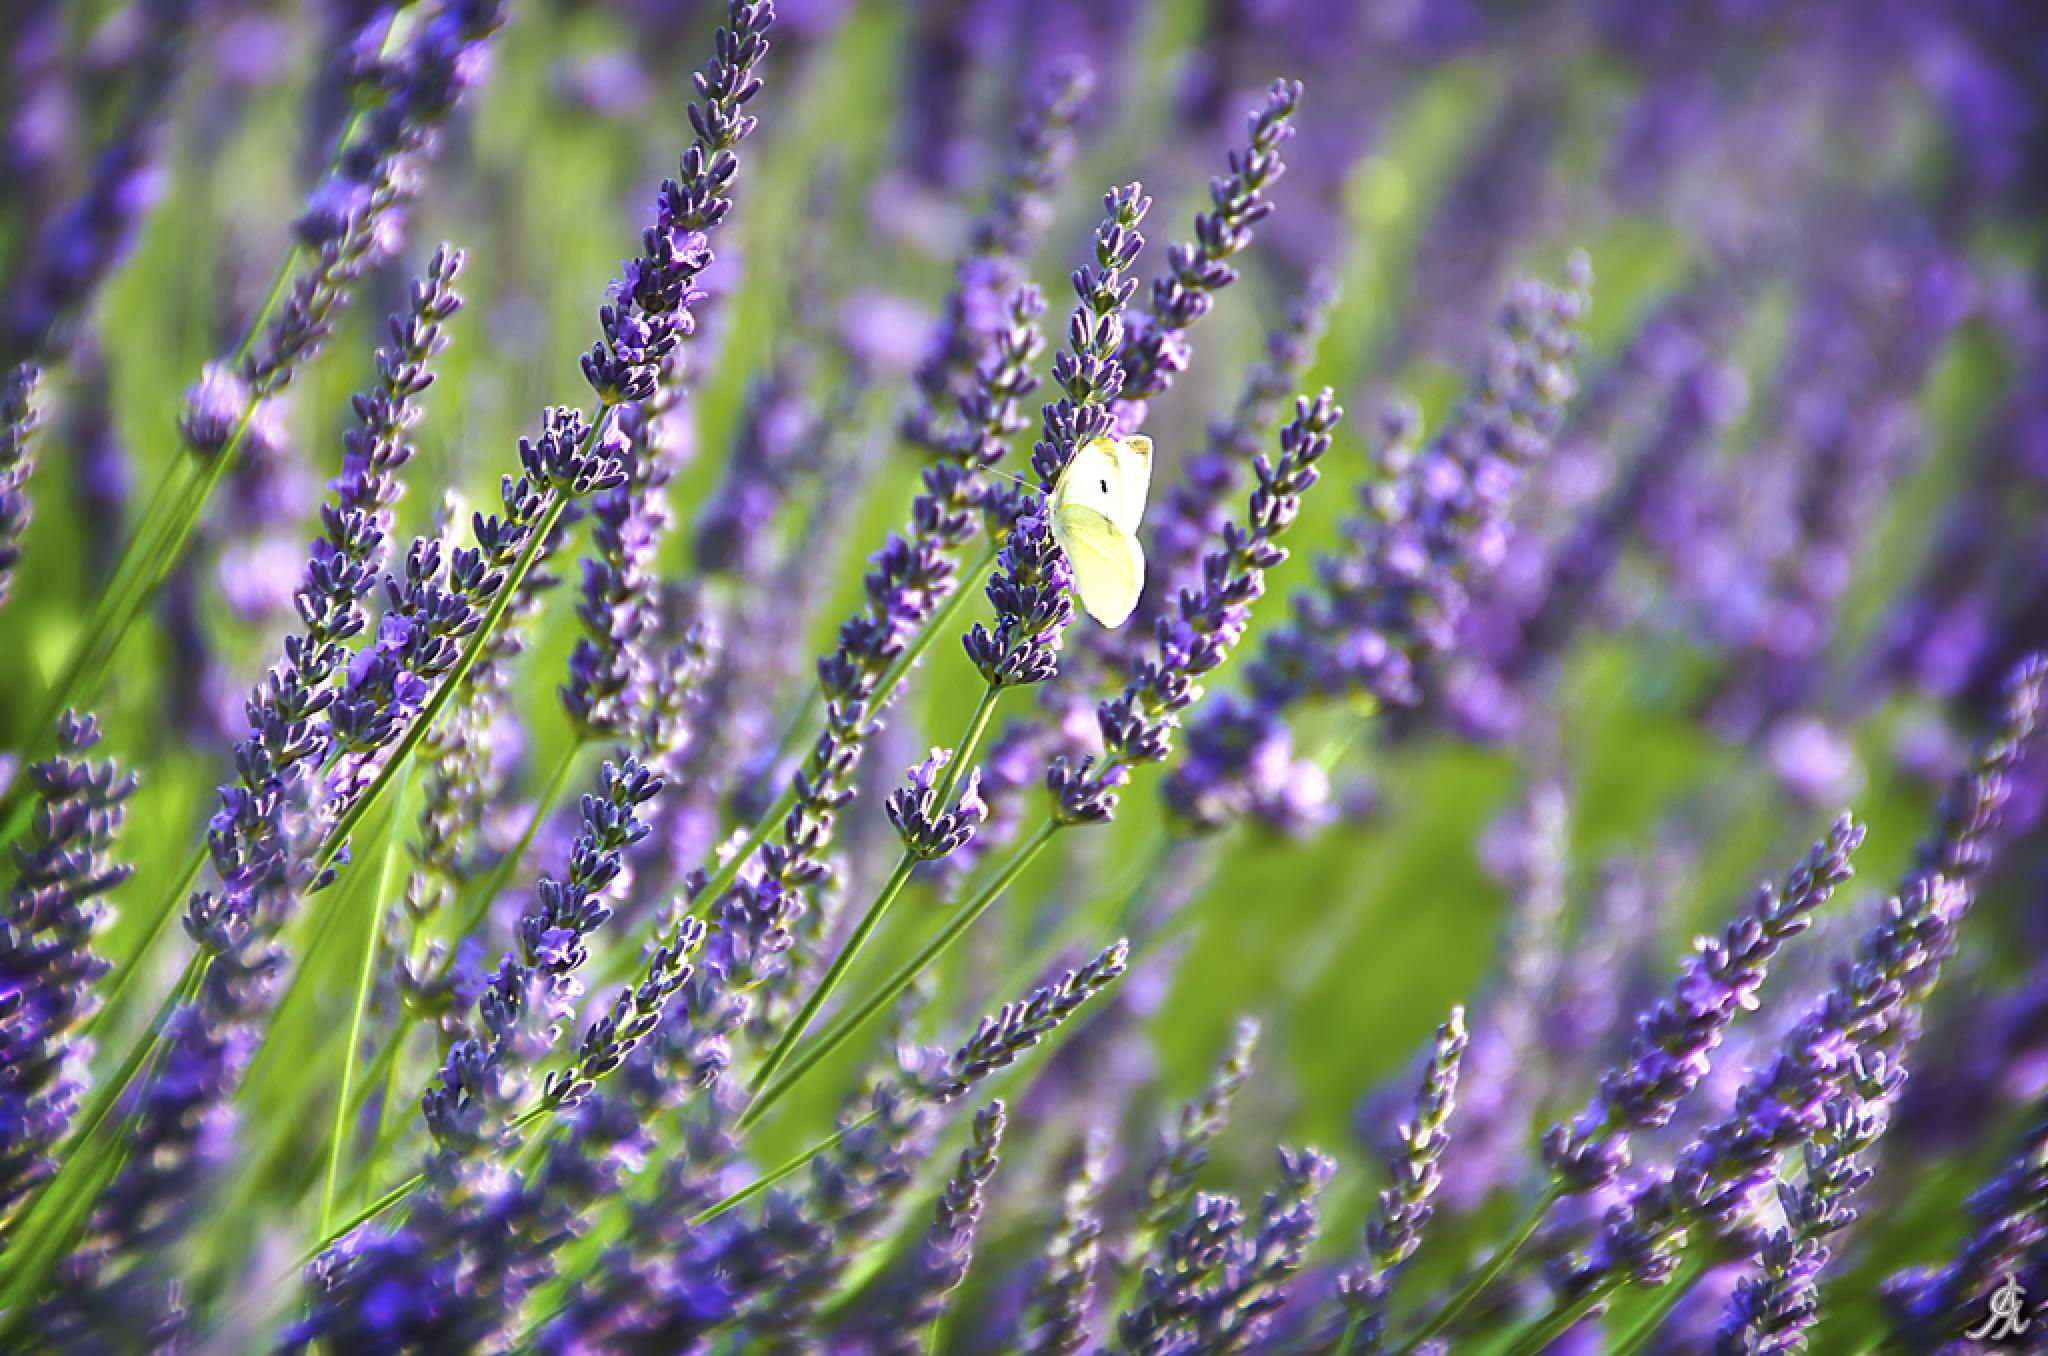 Life into the purple by Alessandro Giorgi Art Photography